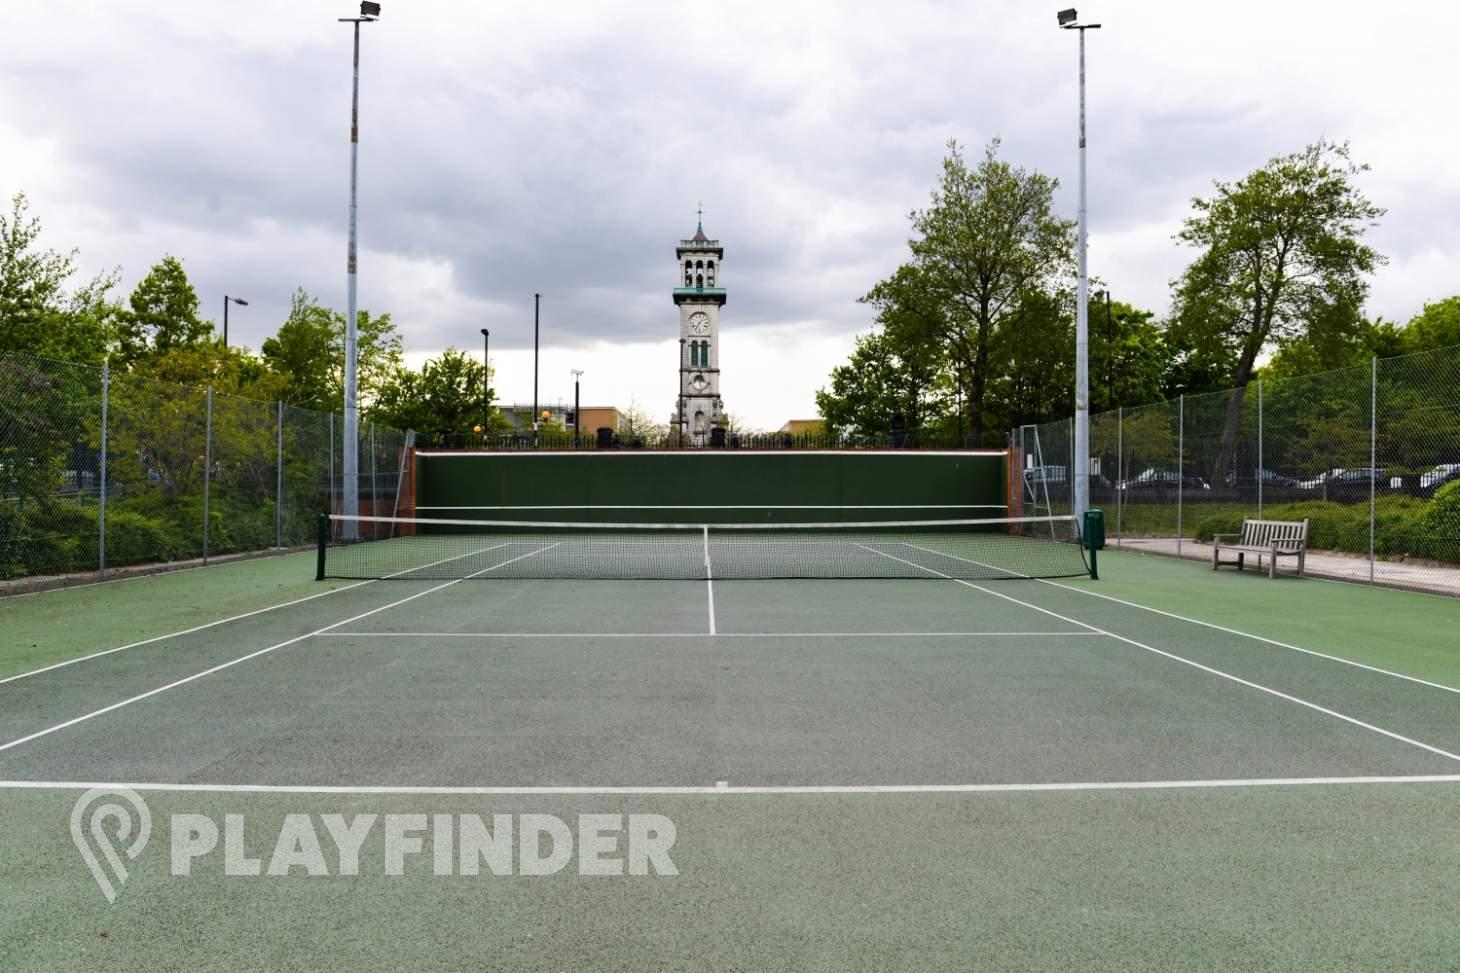 Islington Tennis Centre Outdoor | Hard (macadam) tennis court